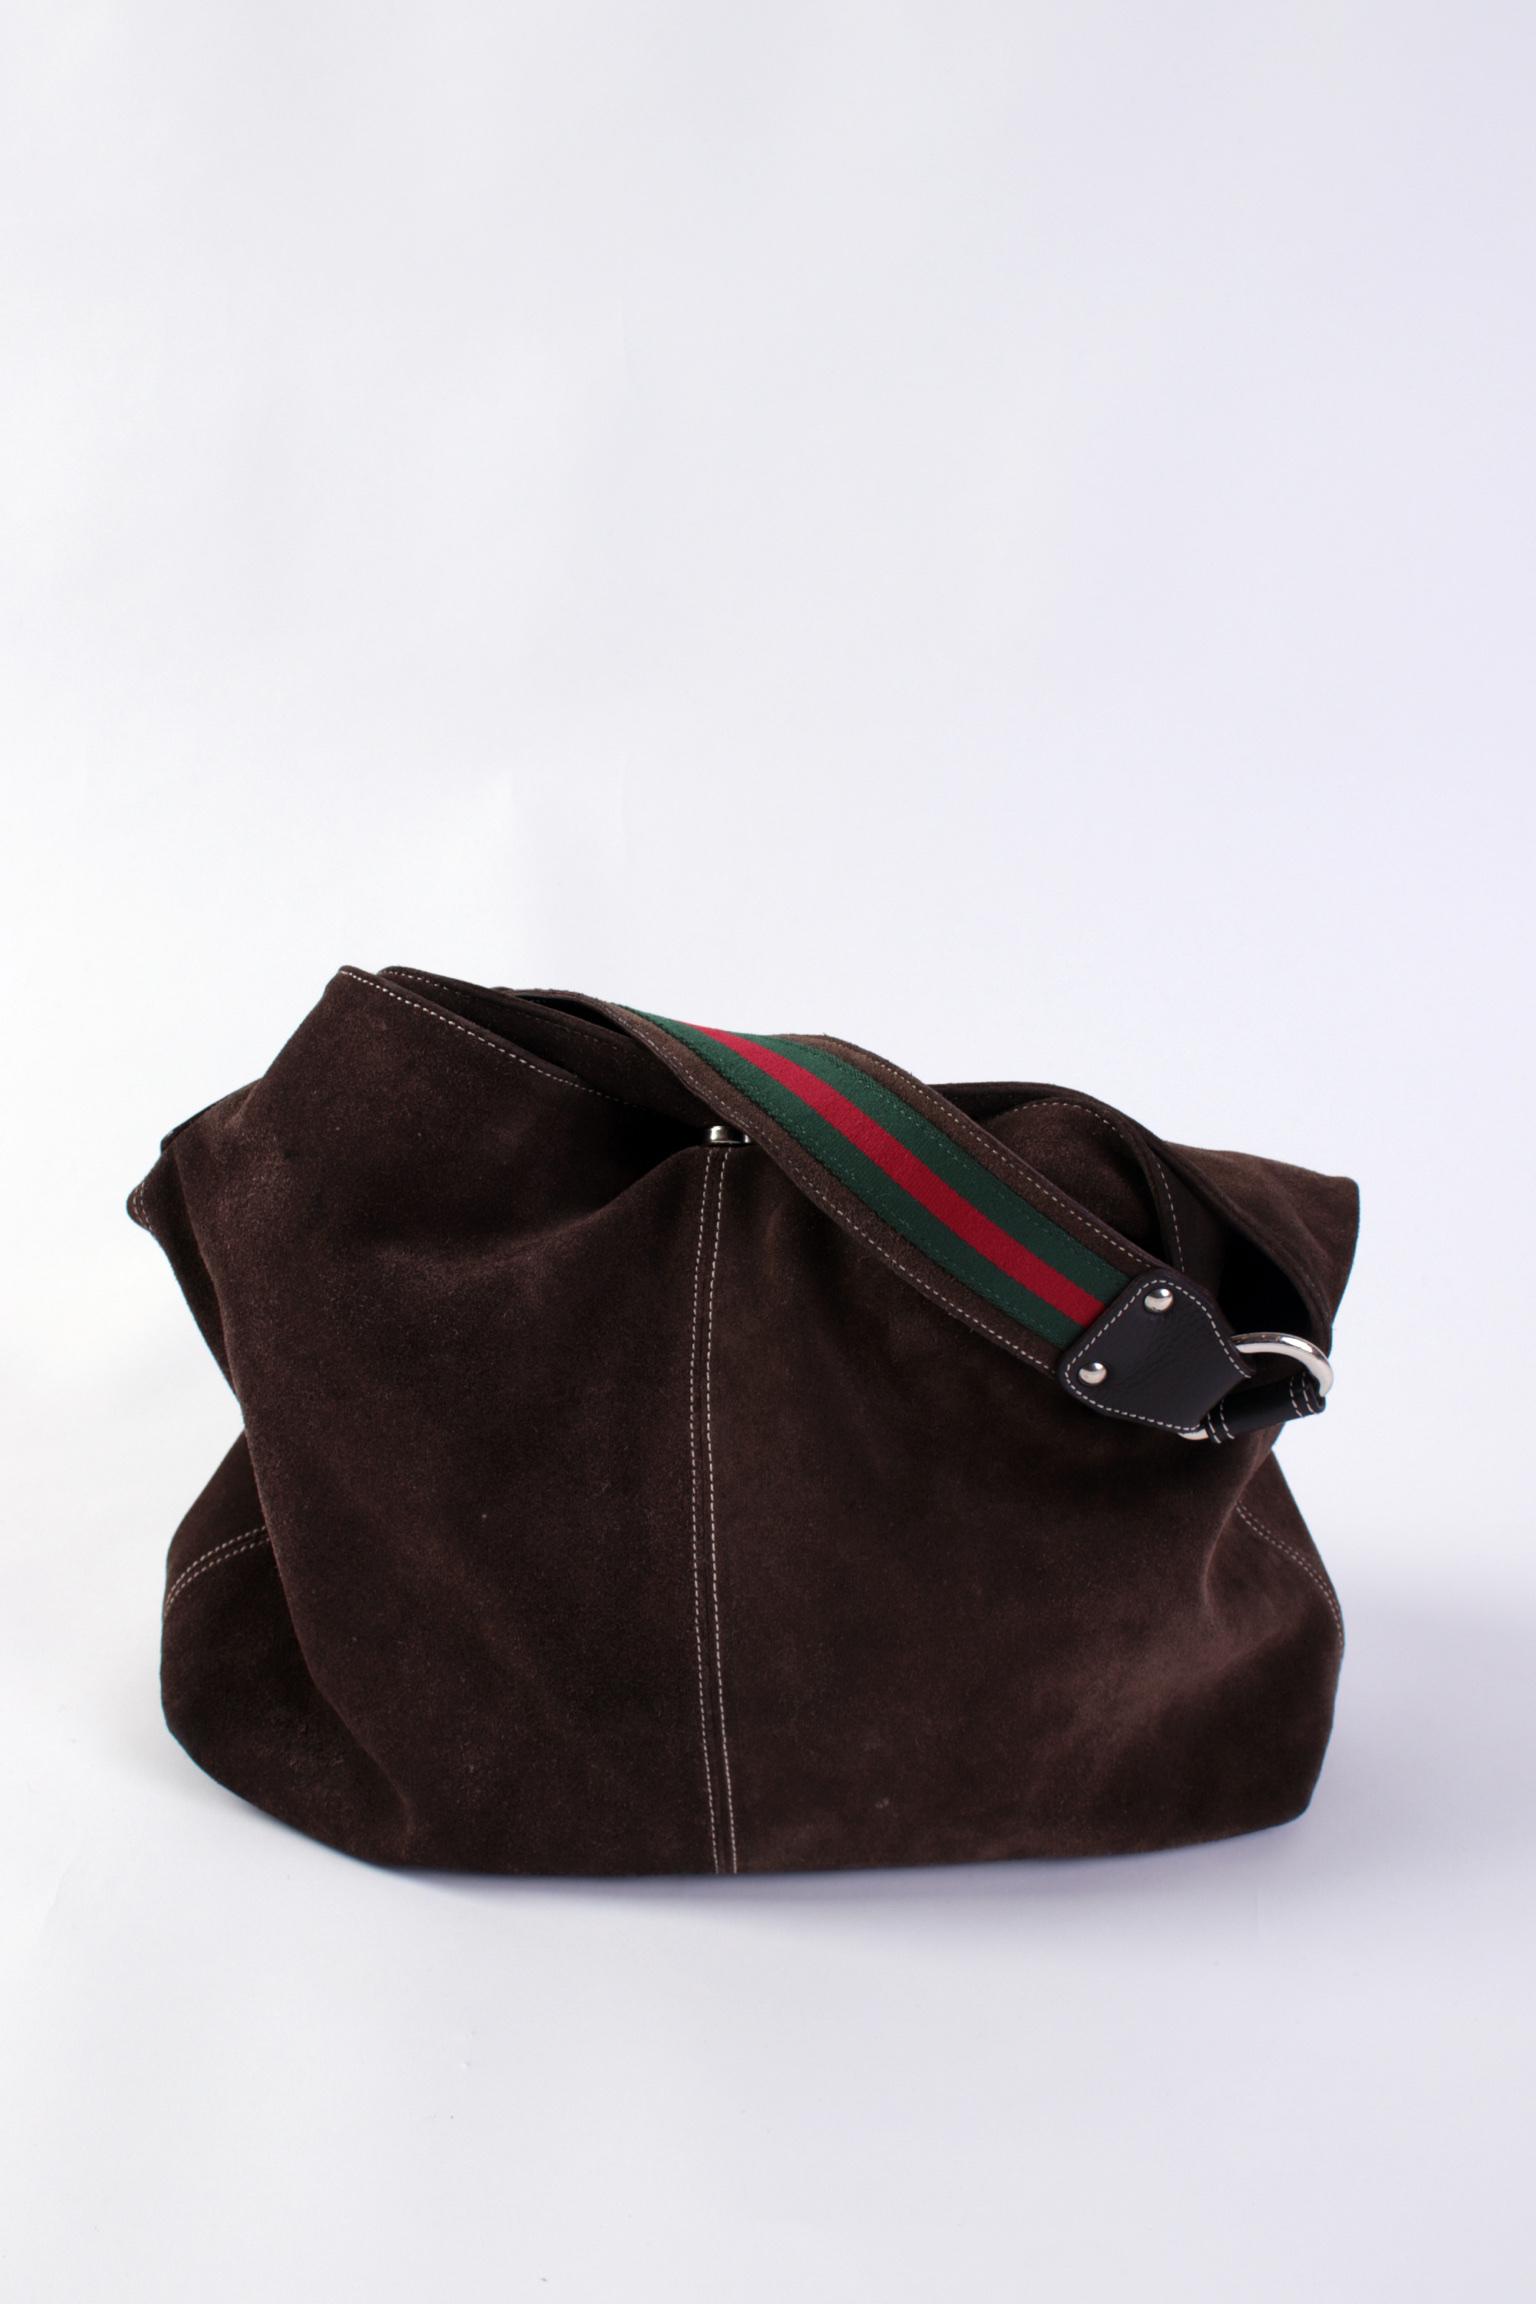 d7da7dfdca97 Gucci Suede Handbag – Hanna Oaks